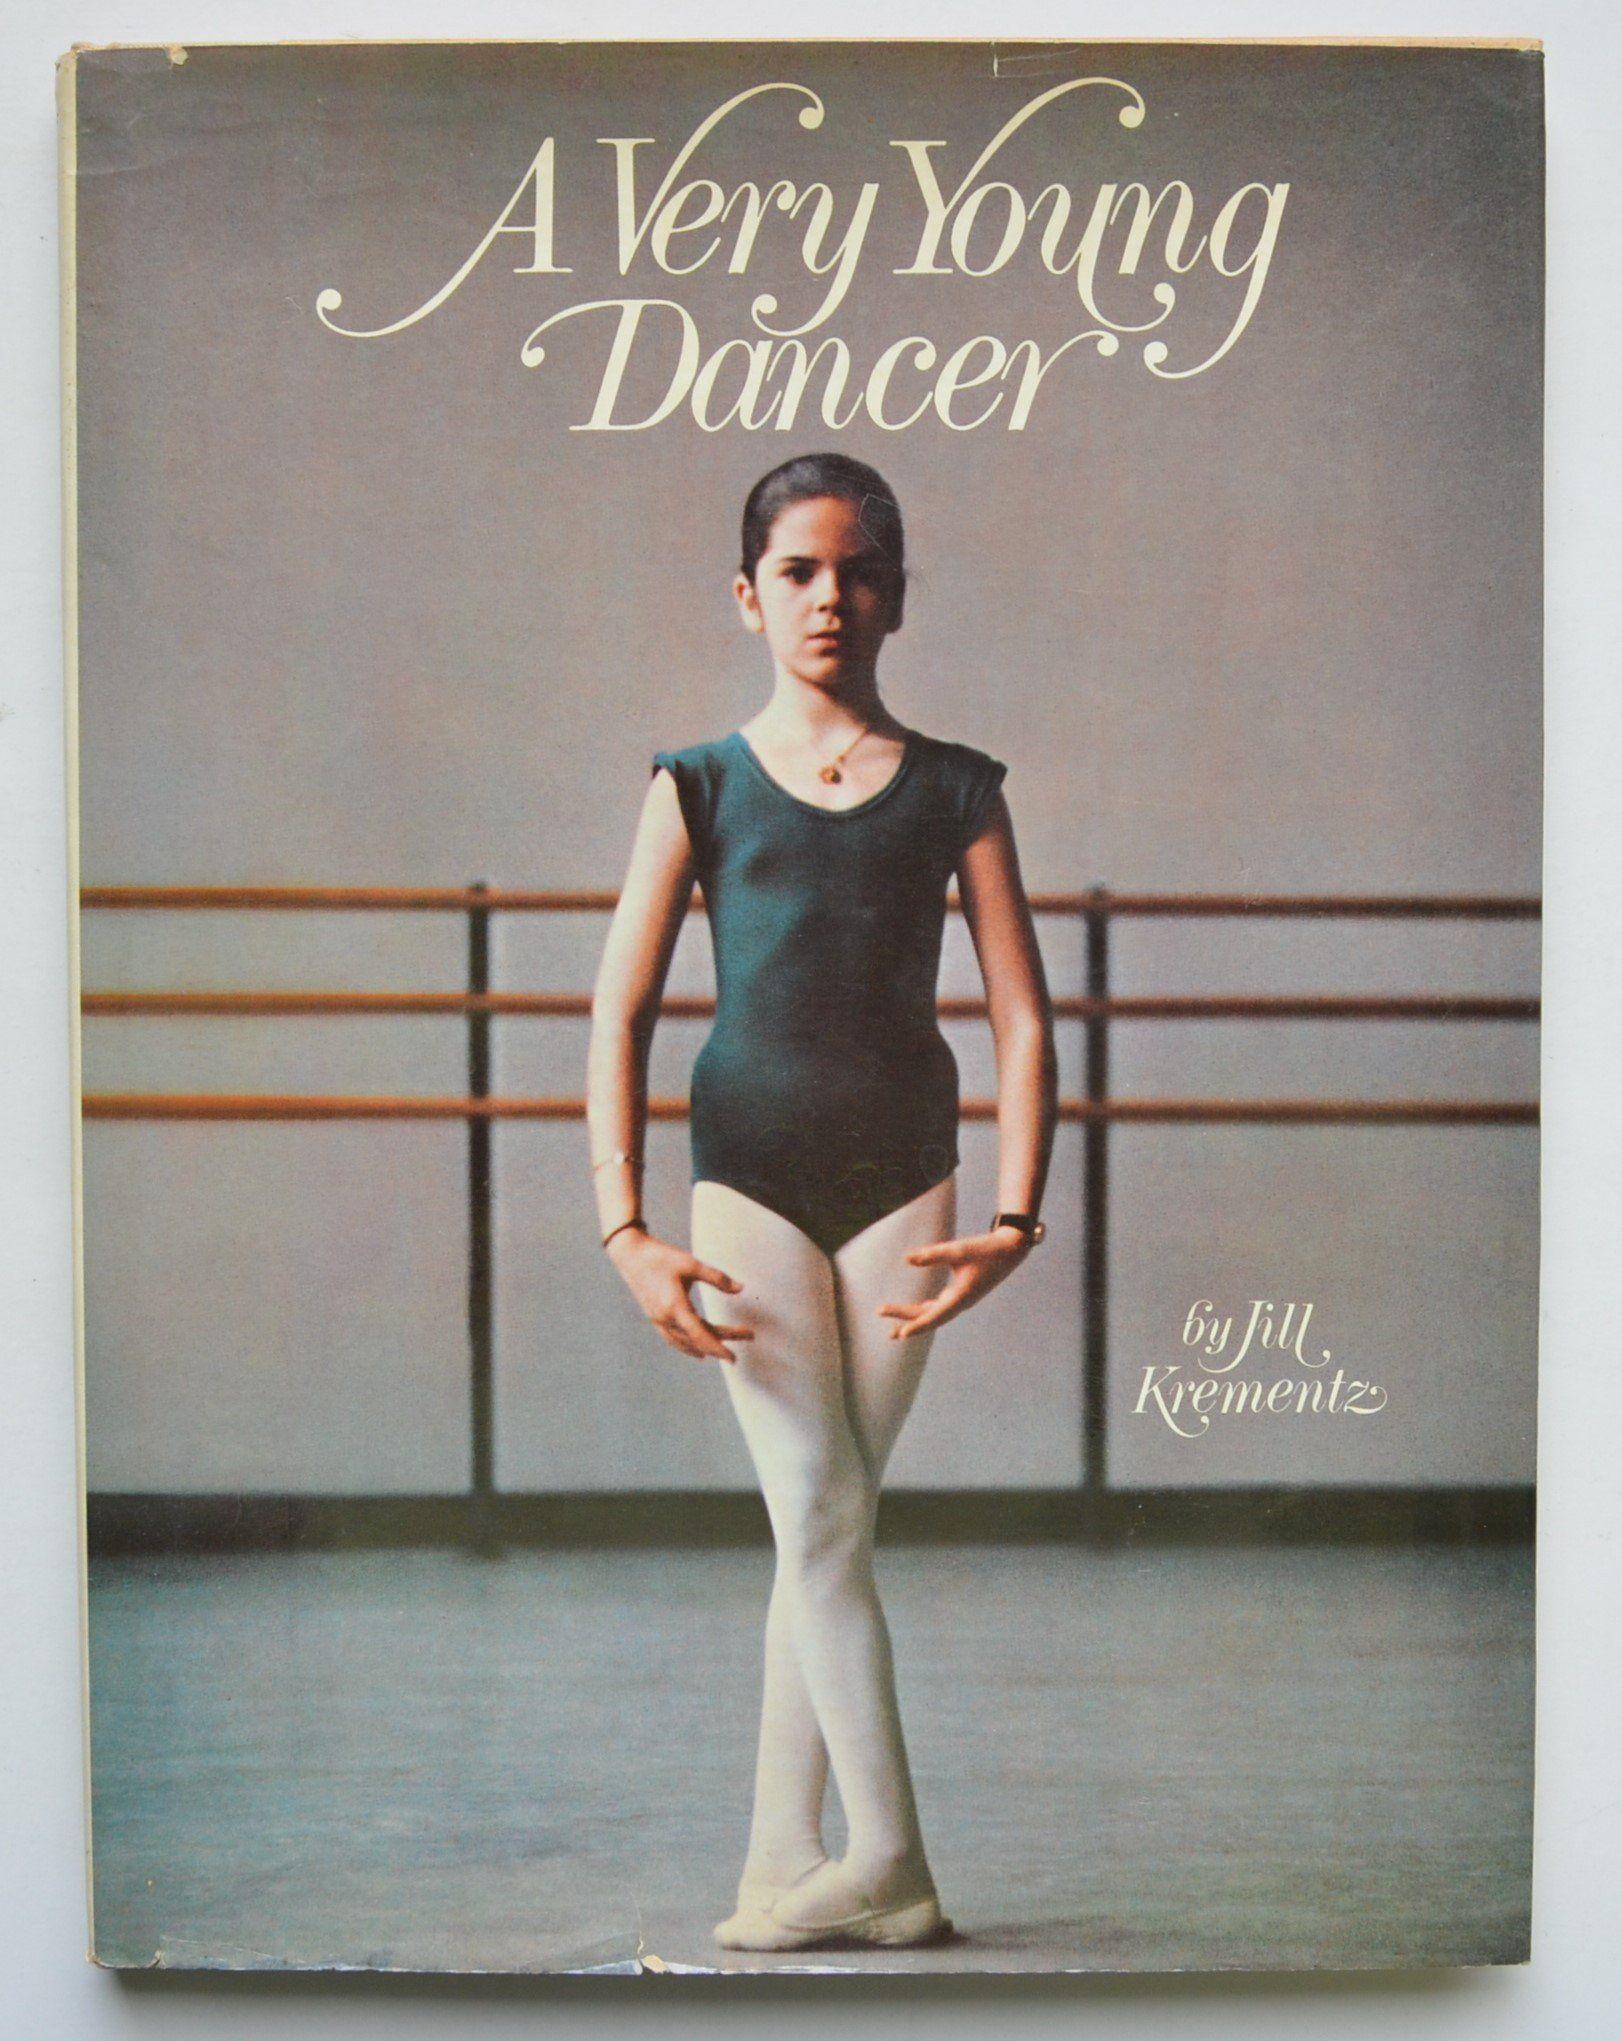 A very young dancer by jill krementz first edition